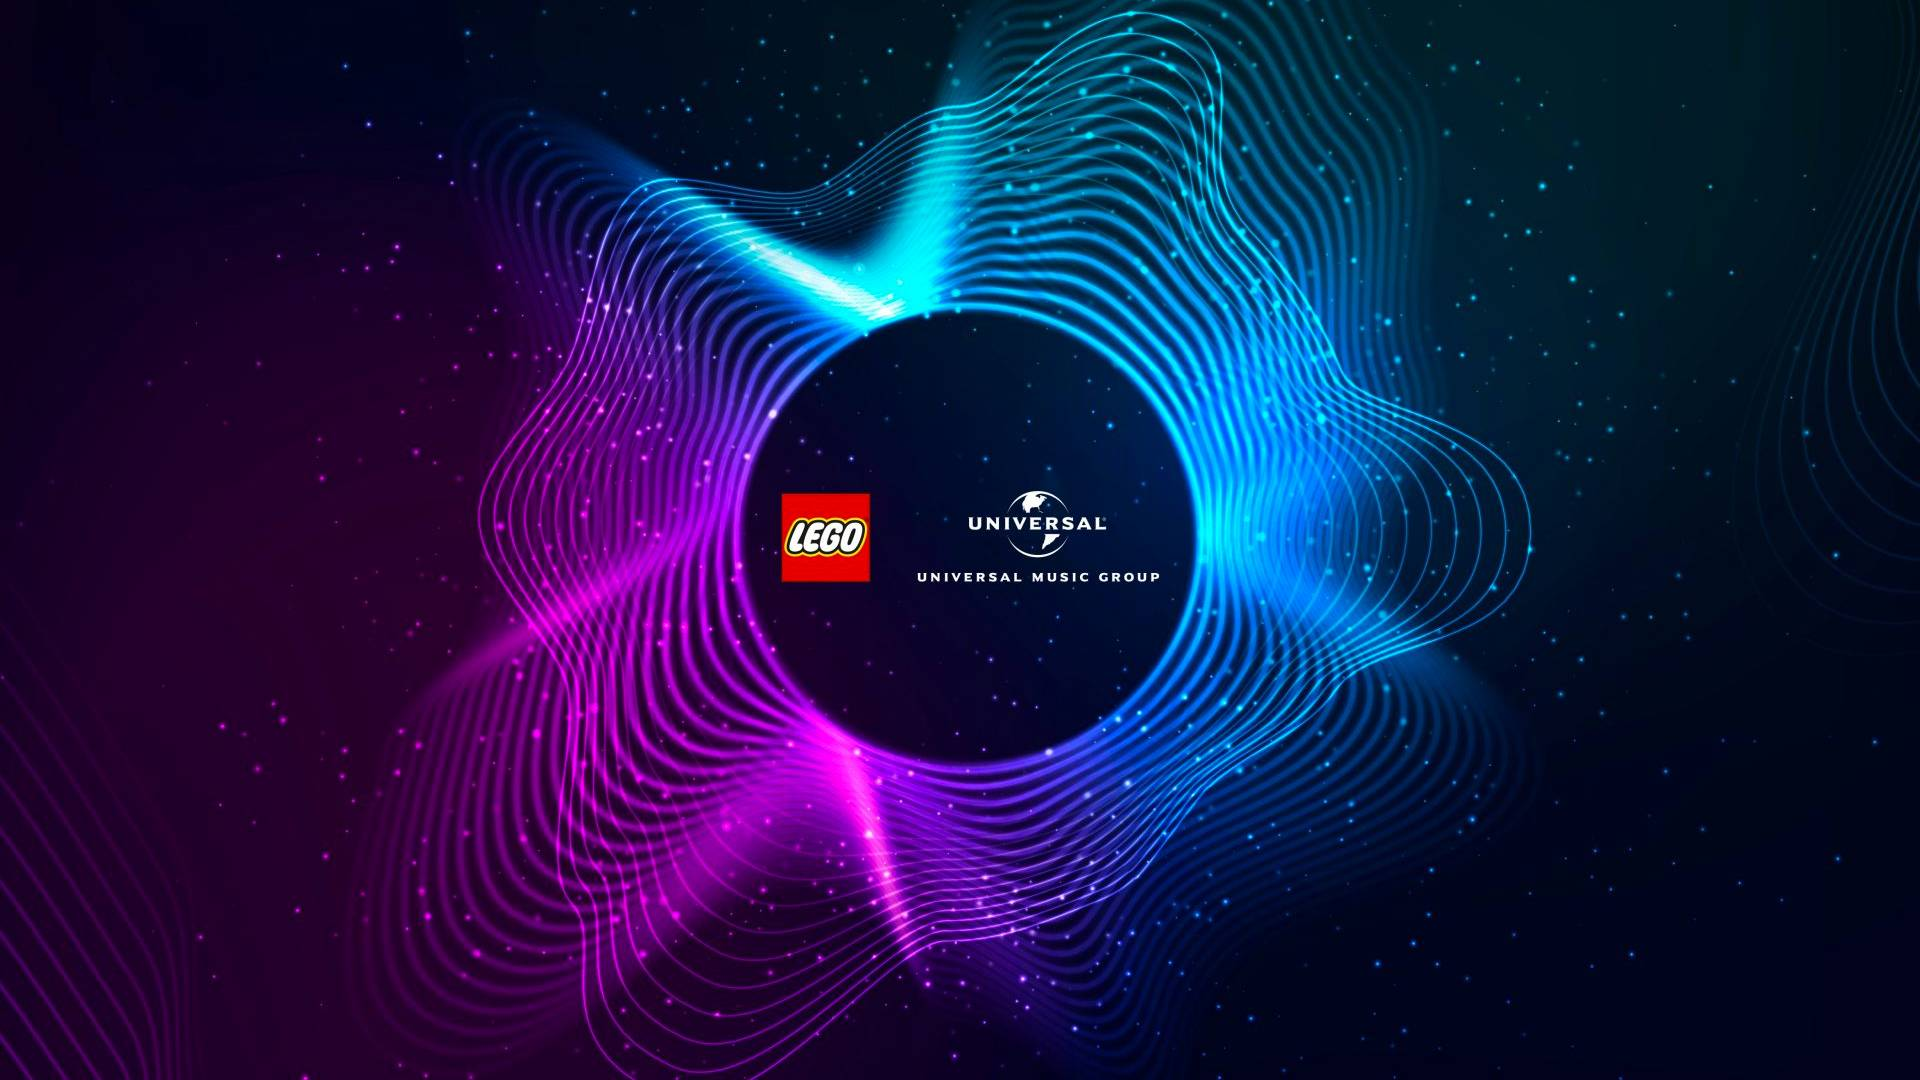 Accordo Universal Music Group the Lego Group